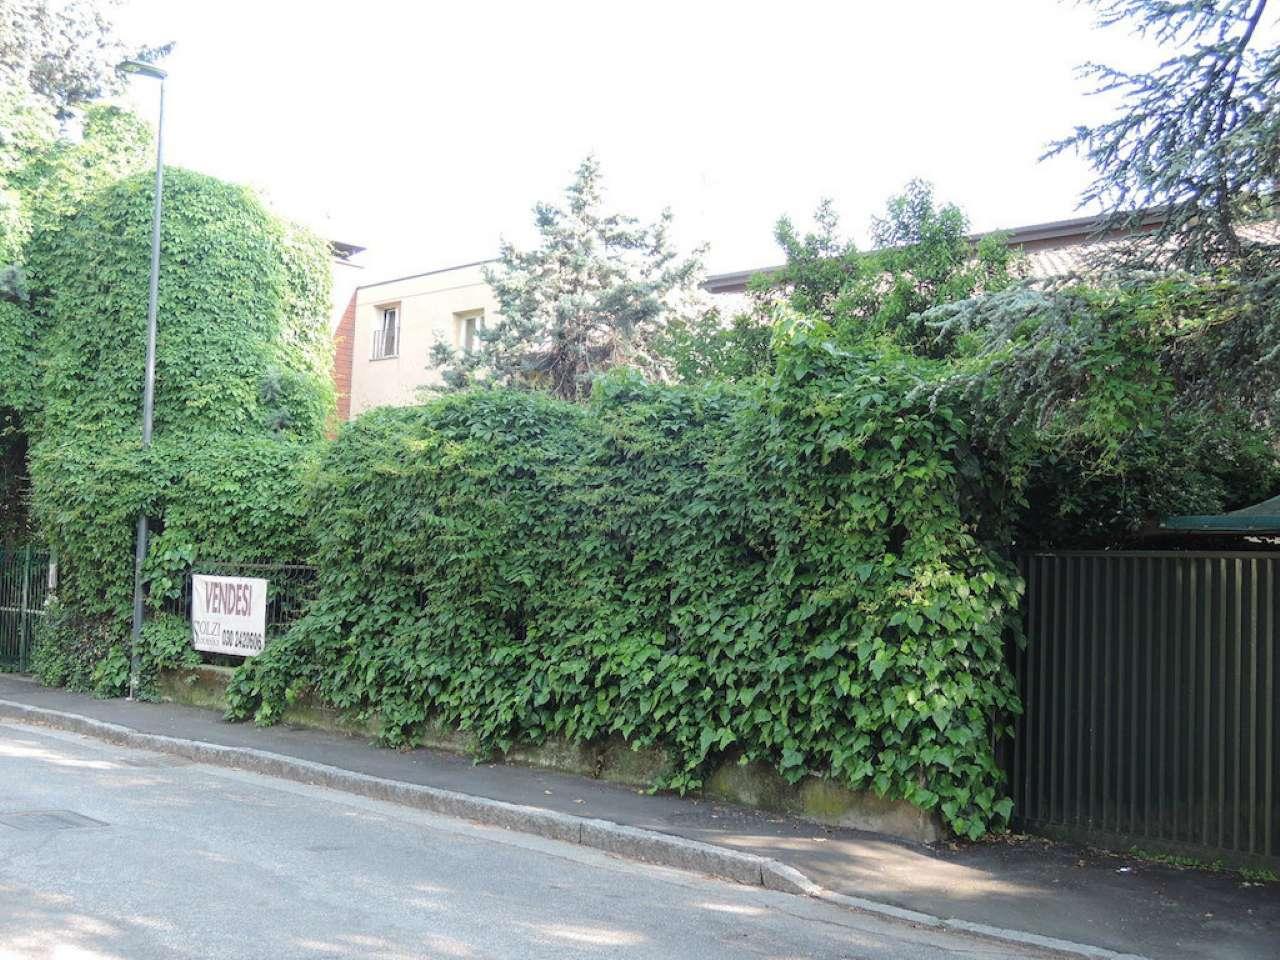 brescia vendita quart: porta venezia solzi immobiliare